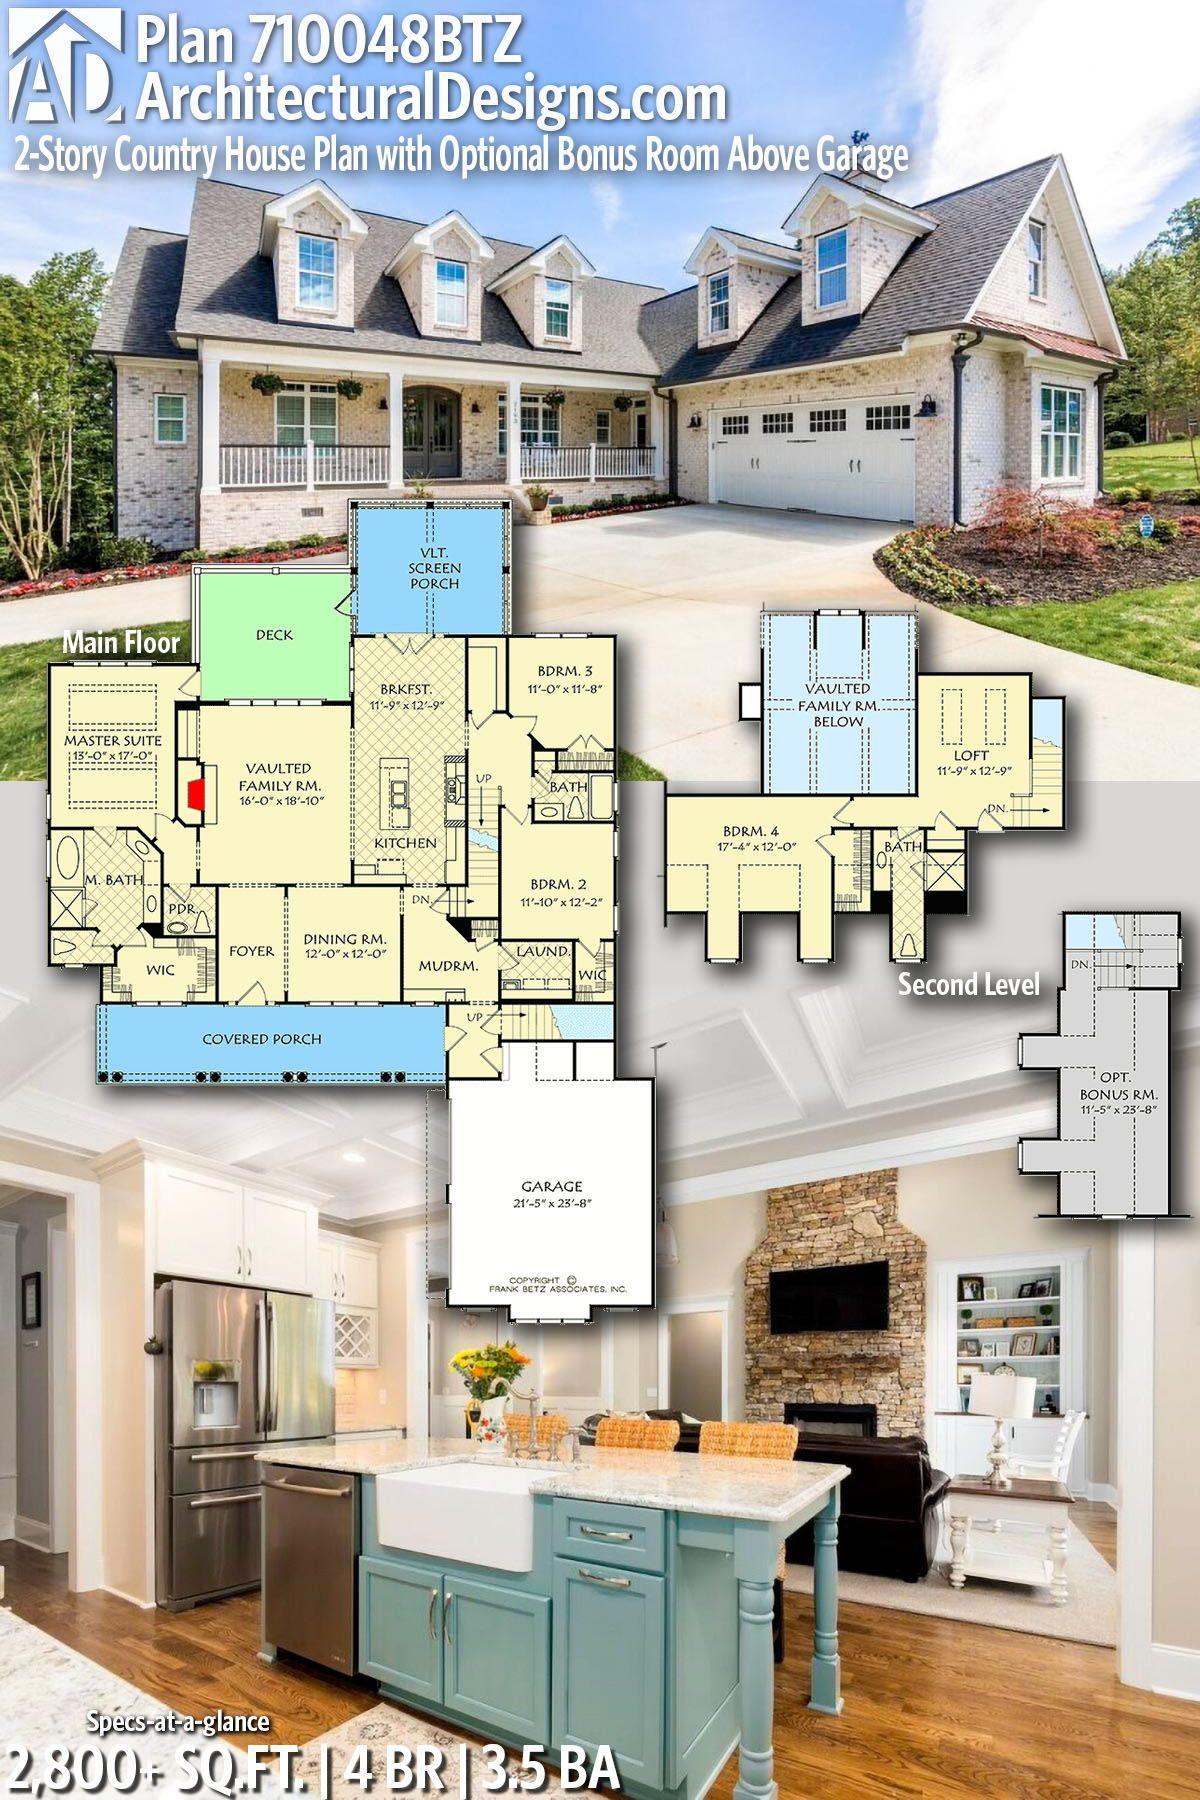 Plan 710048btz 2 Story Country House Plan With Optional Bonus Room Above Garage House Plans House Blueprints Dream House Plans